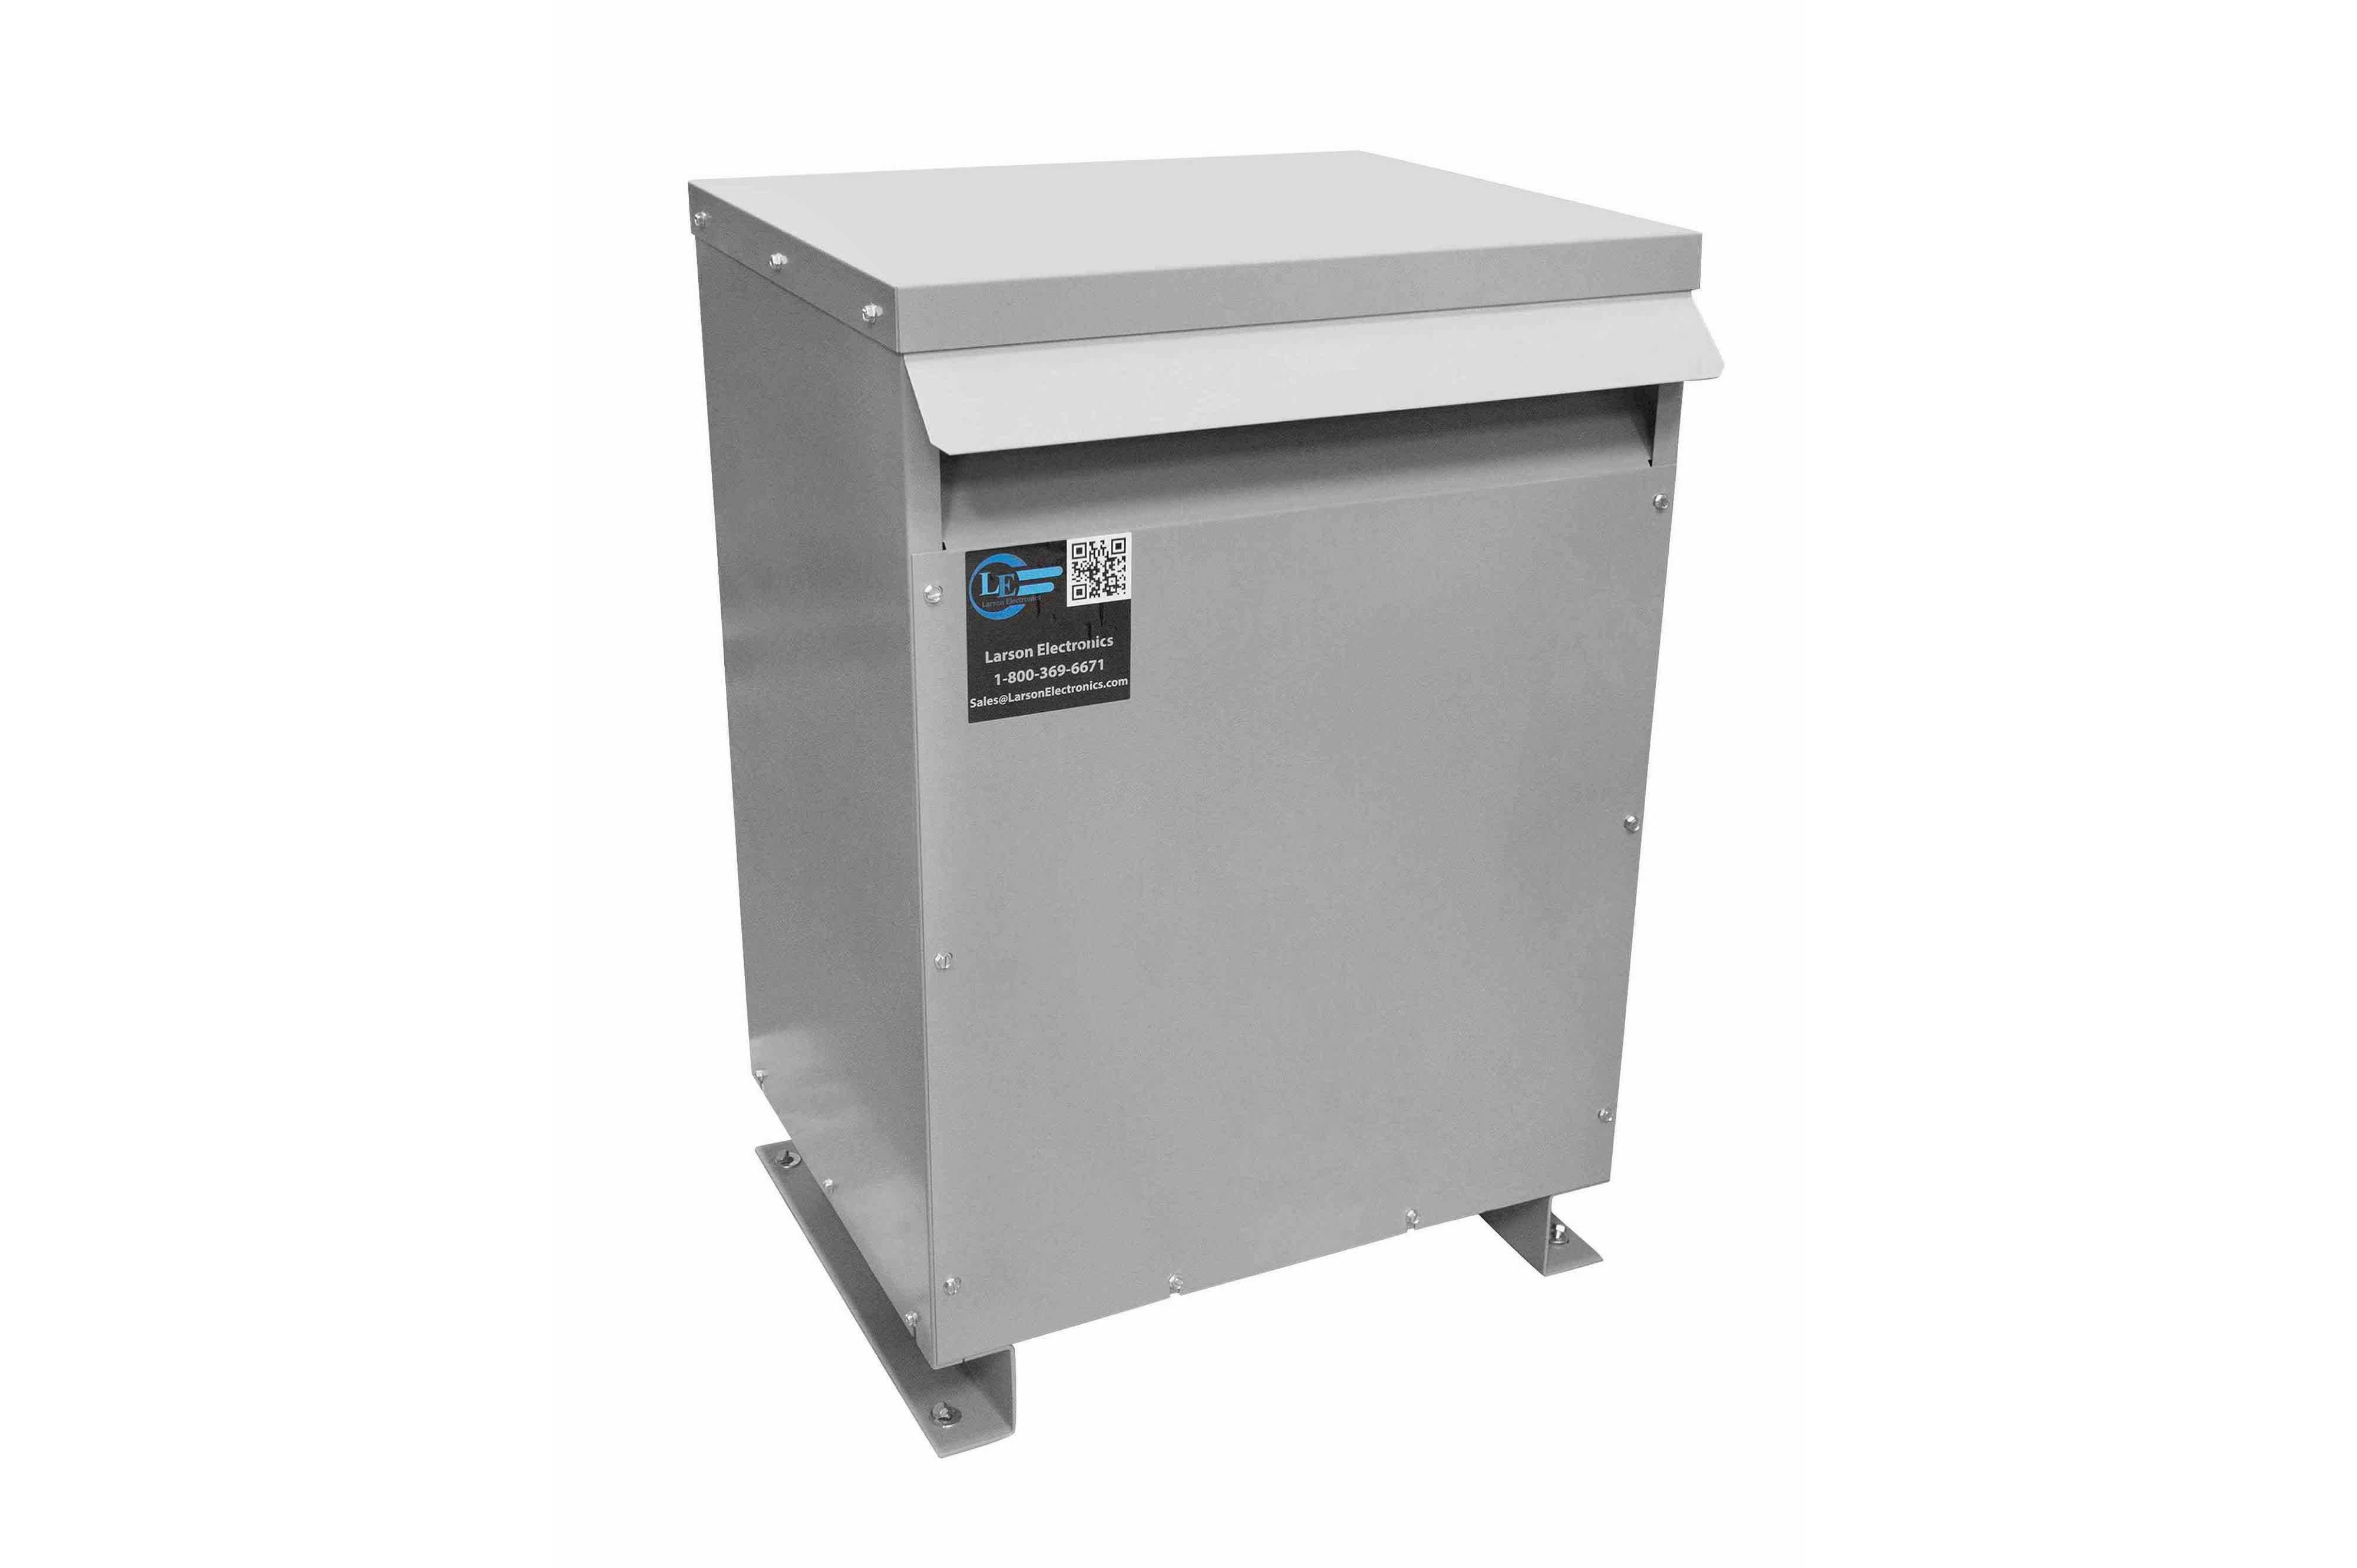 175 kVA 3PH Isolation Transformer, 480V Wye Primary, 208Y/120 Wye-N Secondary, N3R, Ventilated, 60 Hz